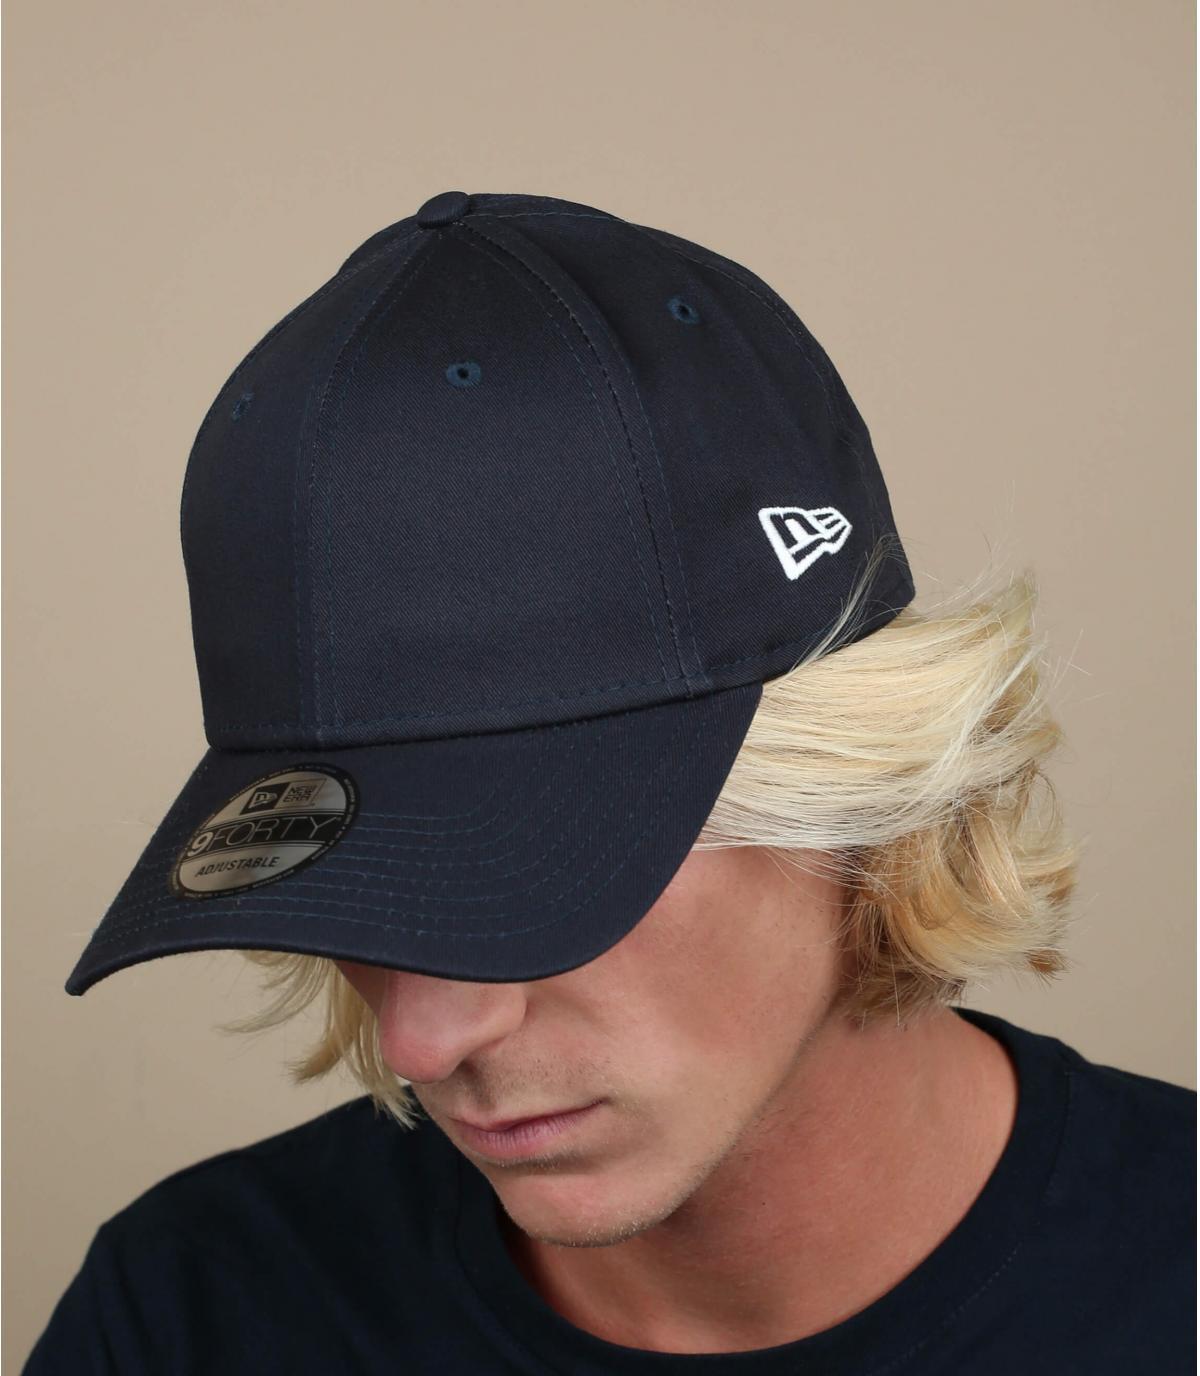 Blau curved visor cap